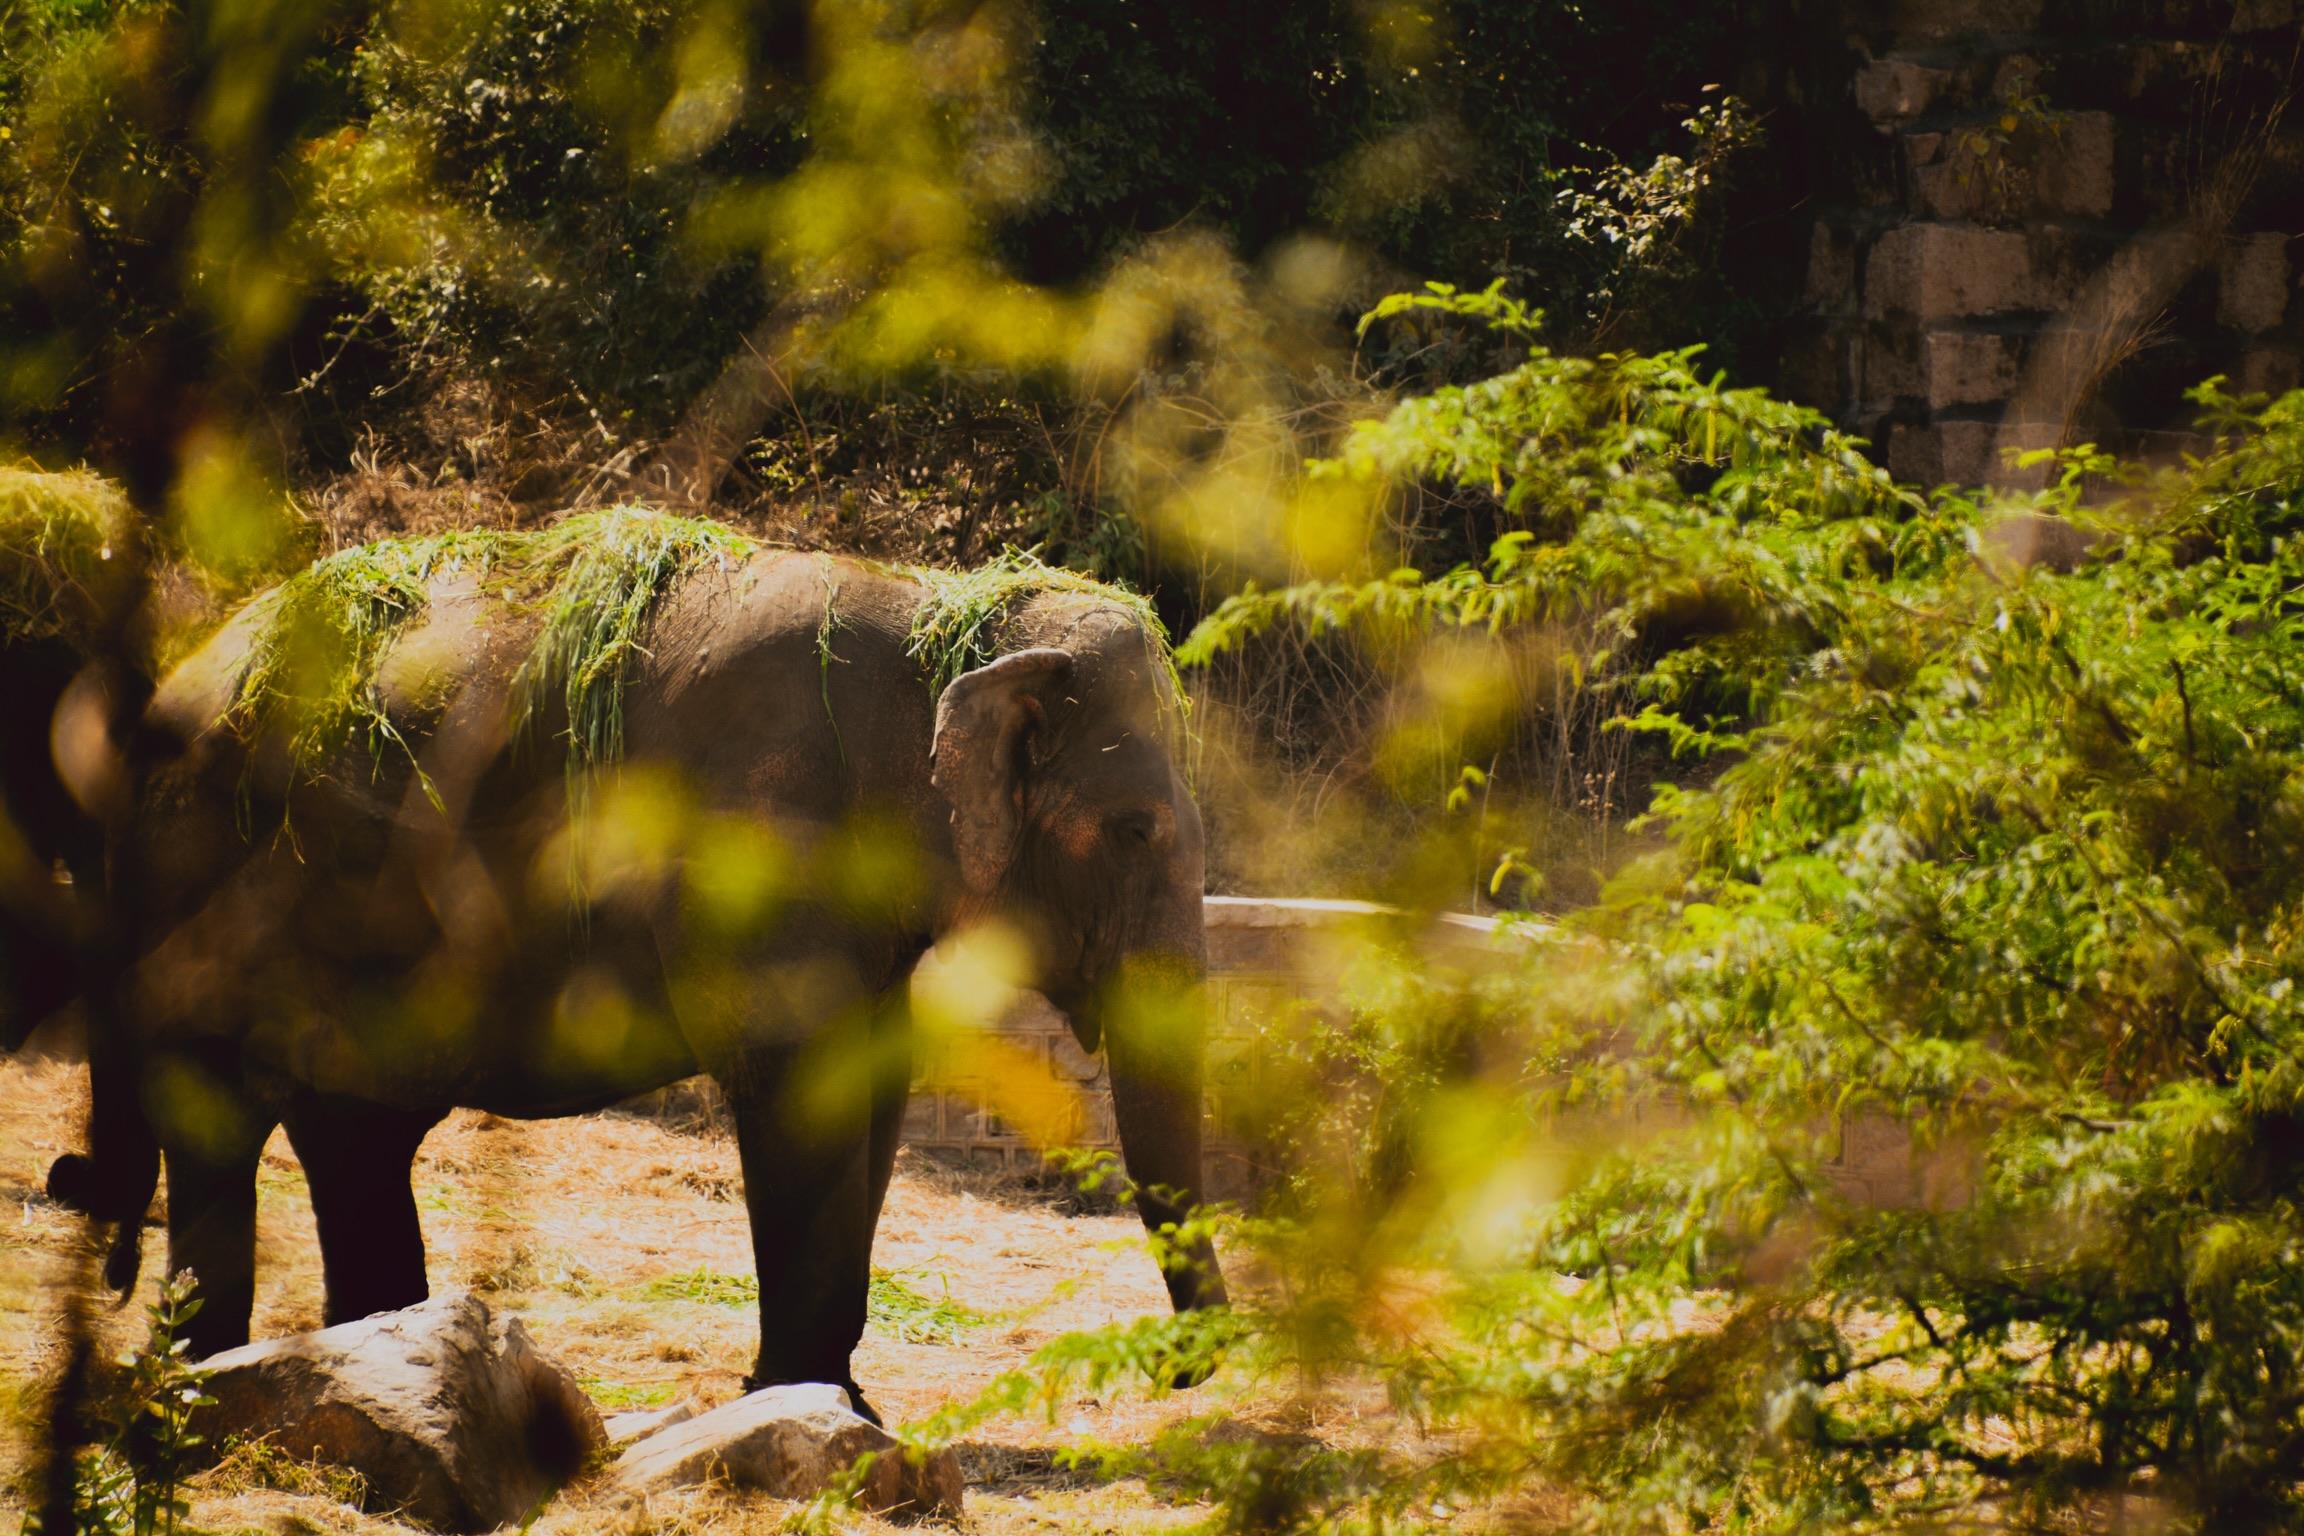 Grass over the Elephant